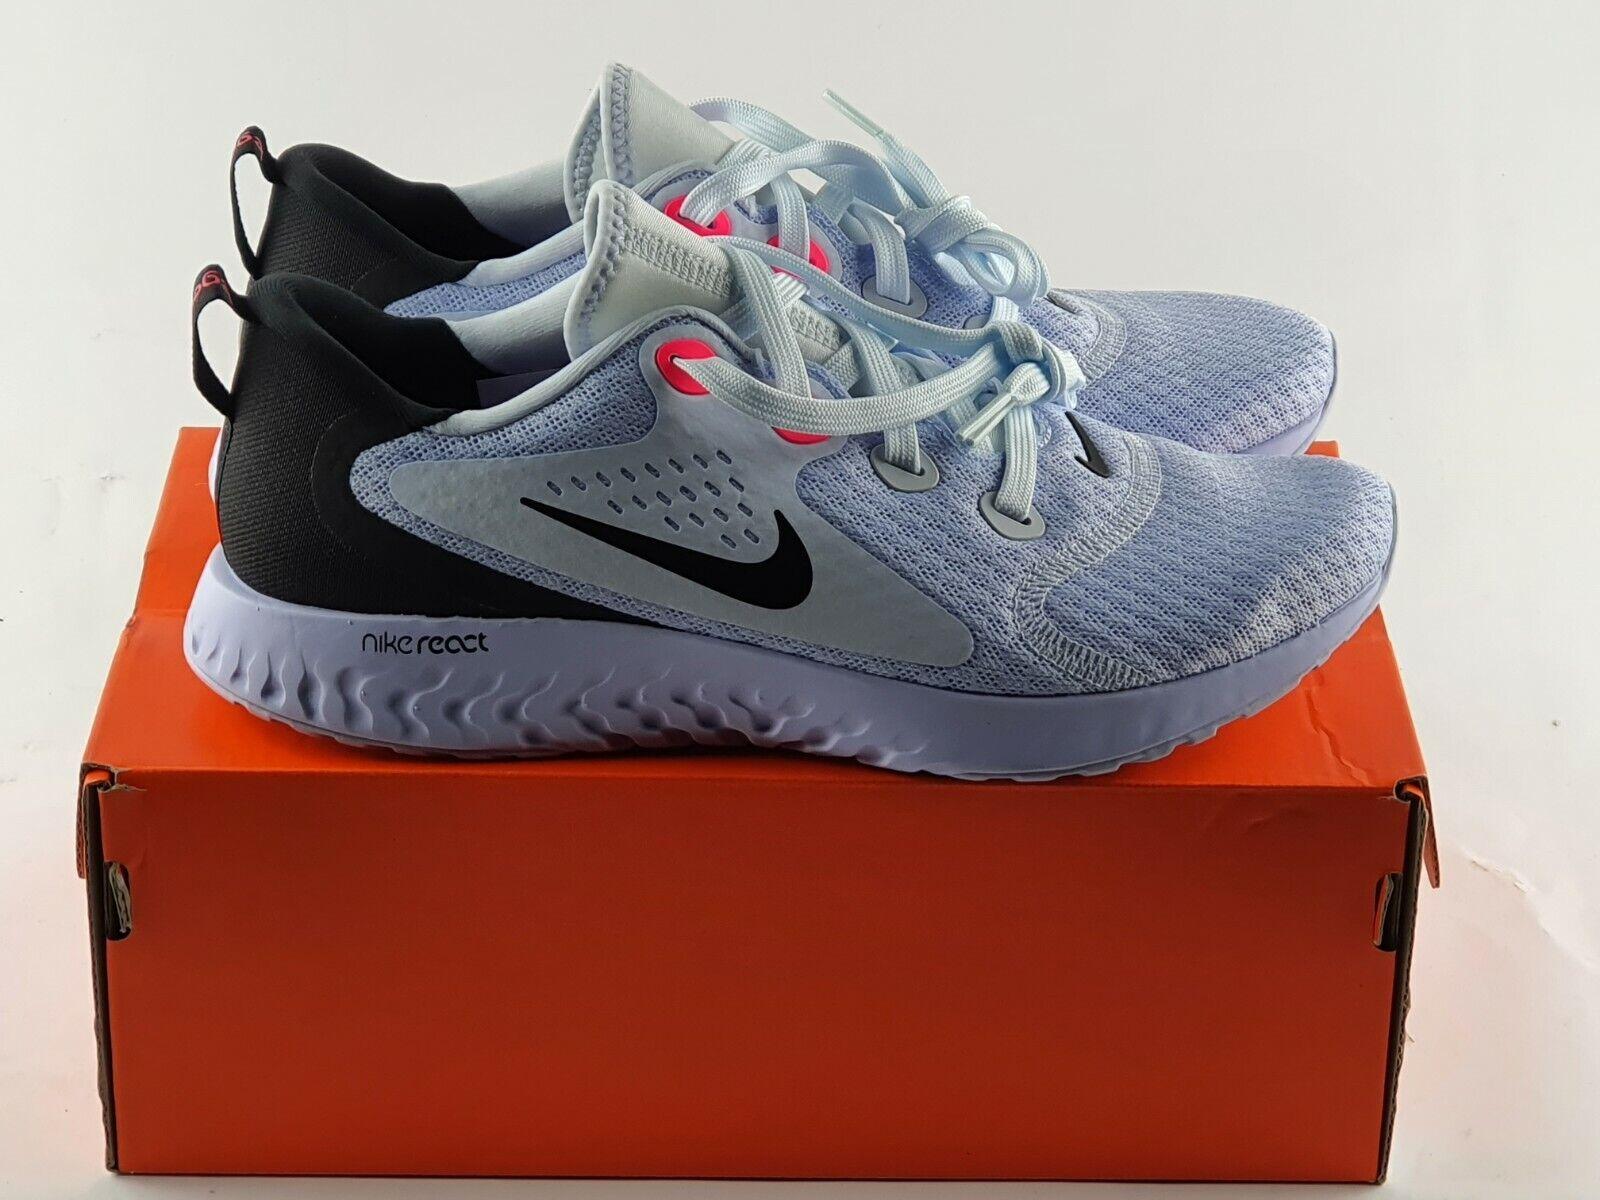 Nike Legend React aa1626 008 Fille Baskets, Chaussures de course